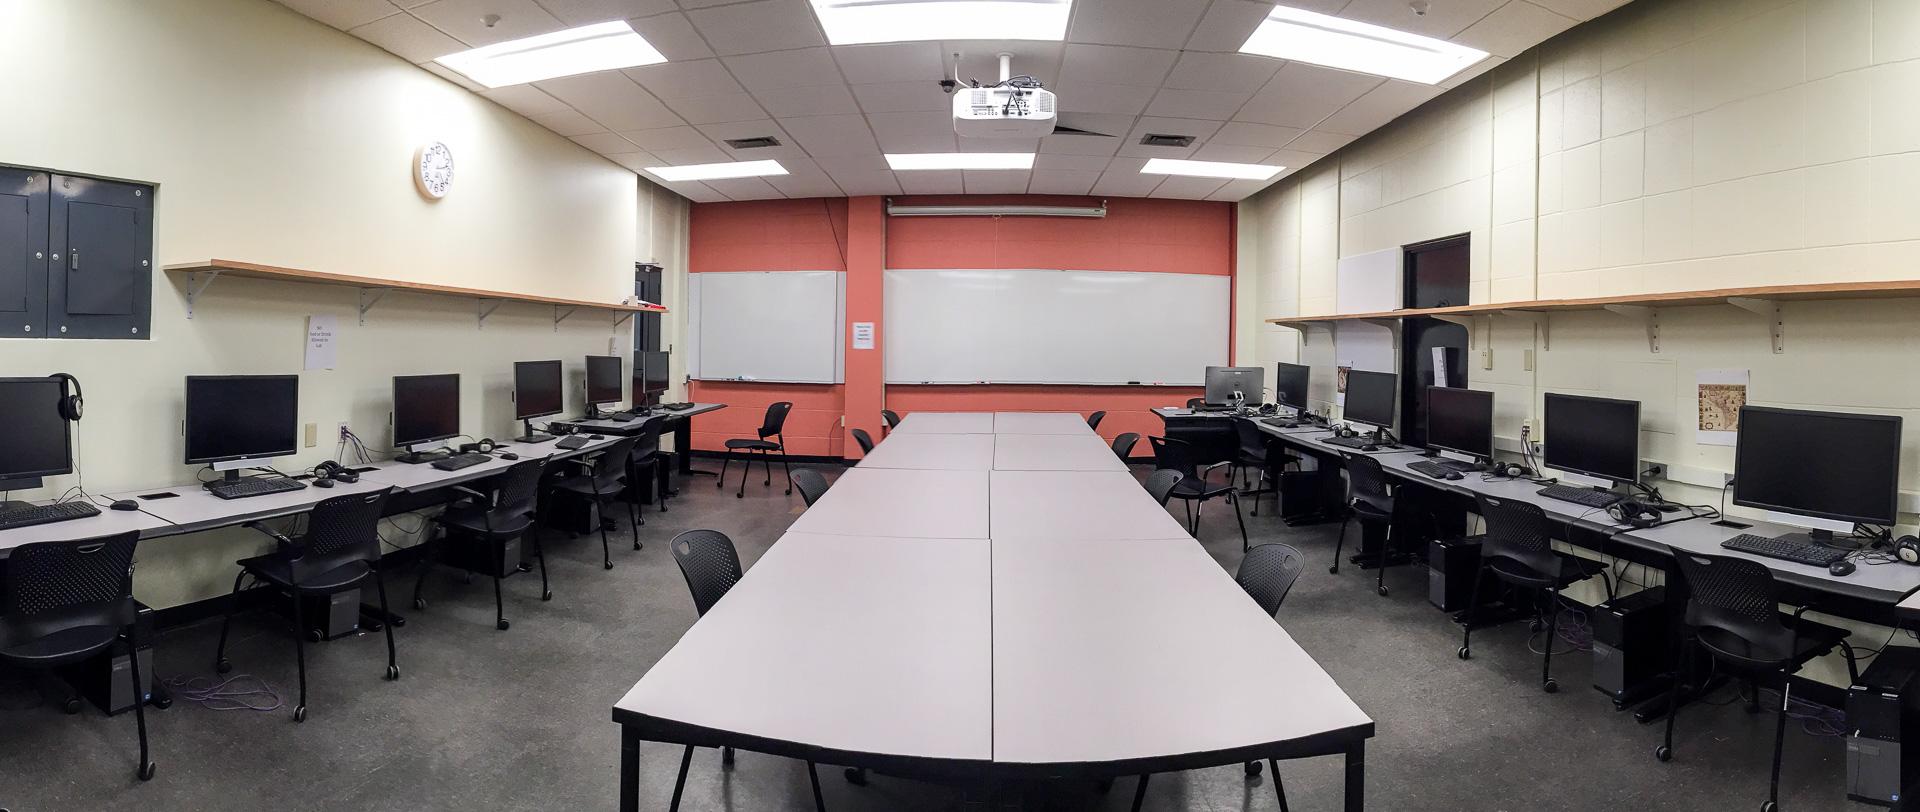 Merrill 215 Computing Lab